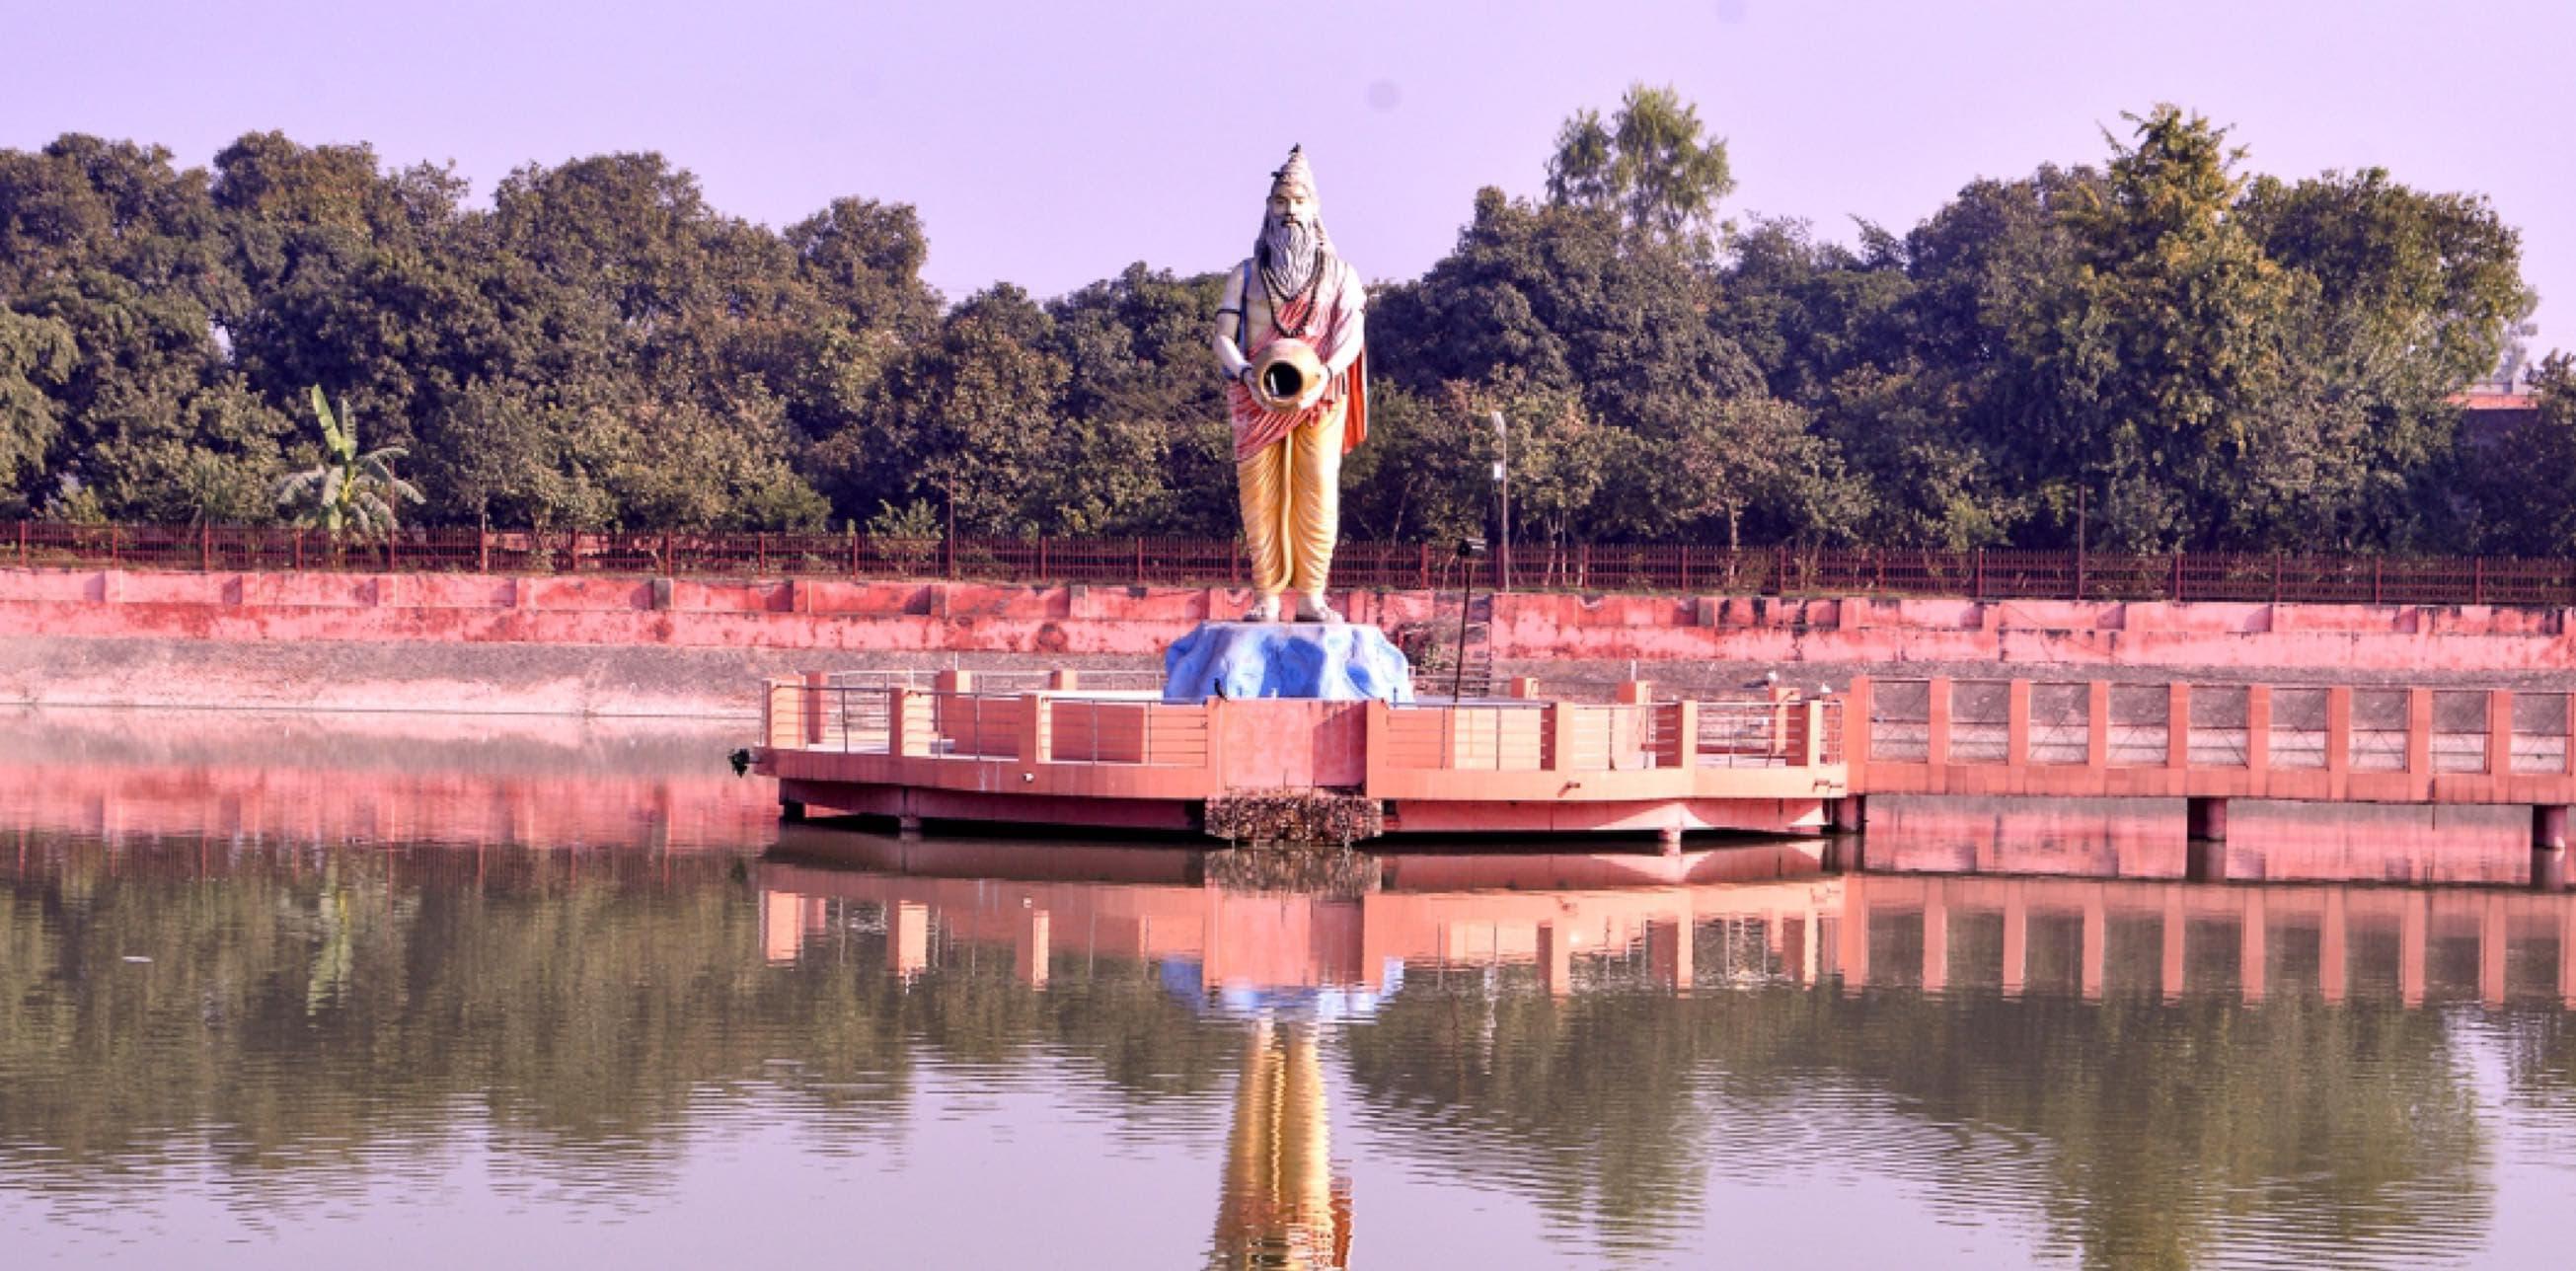 48 KOS KURUKSHETRA – Kurukshetra Development Board